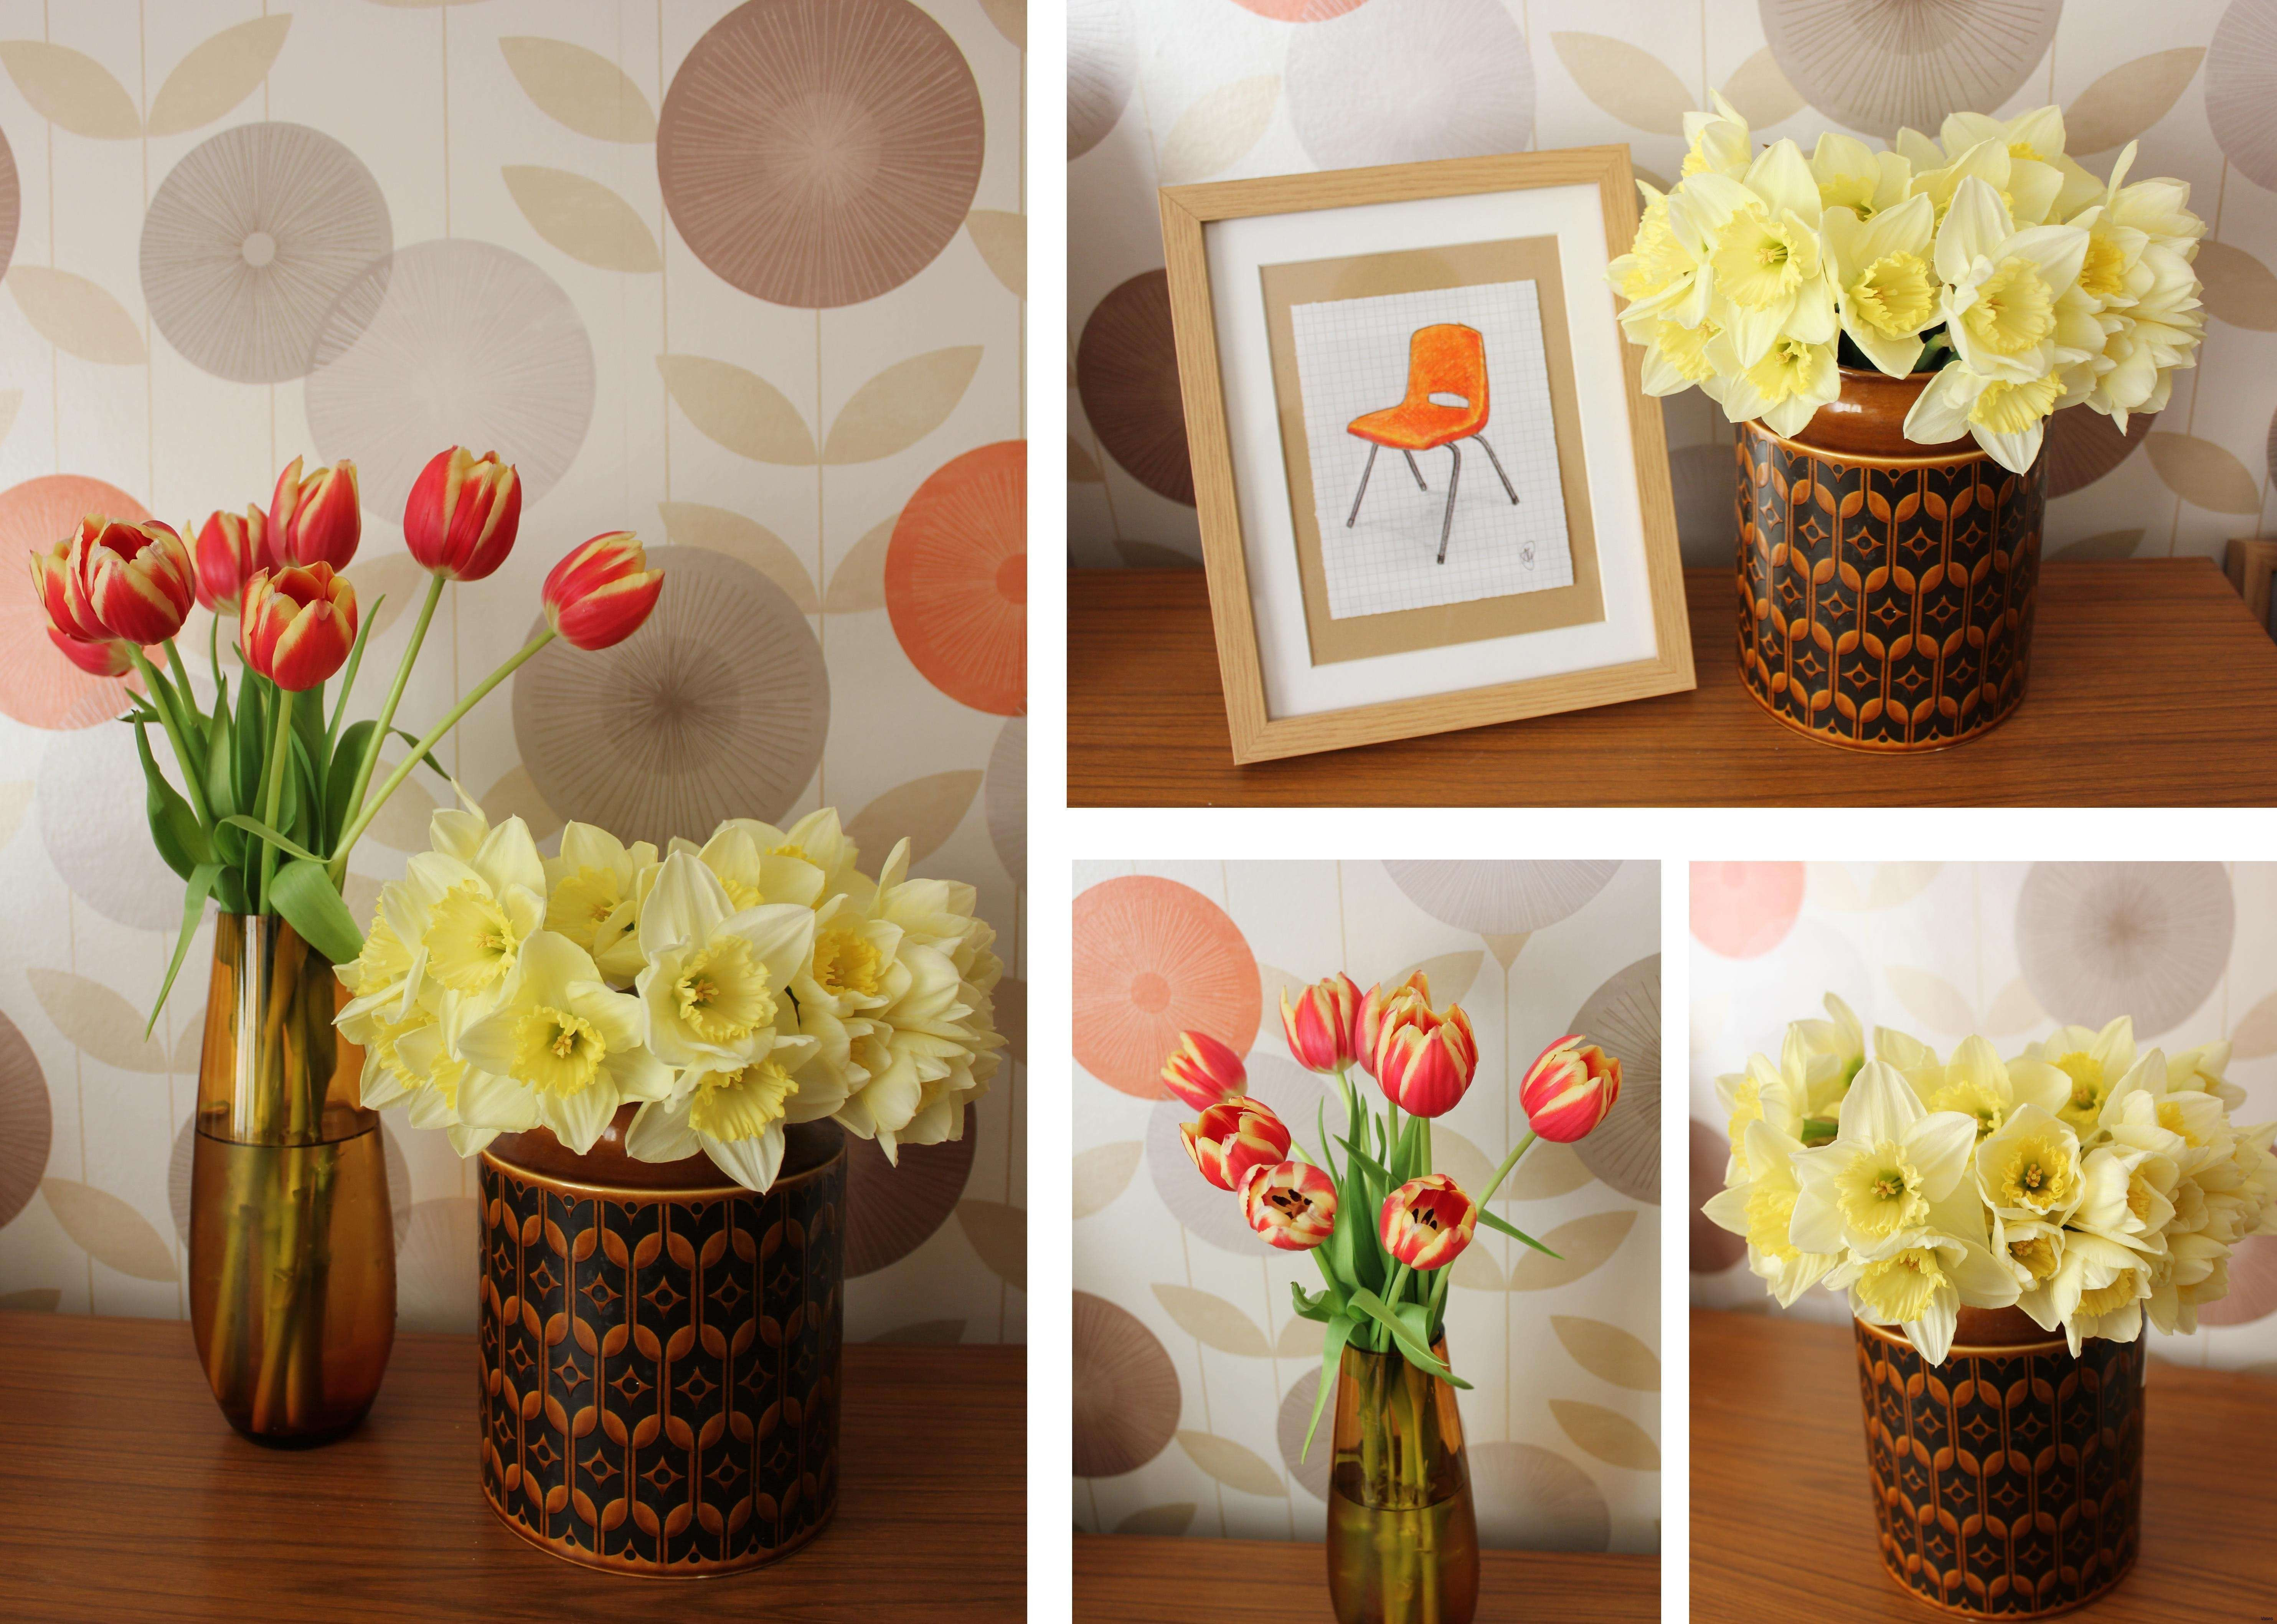 Flower Arrangements for Wedding Centerpieces Spectacular Diy Home